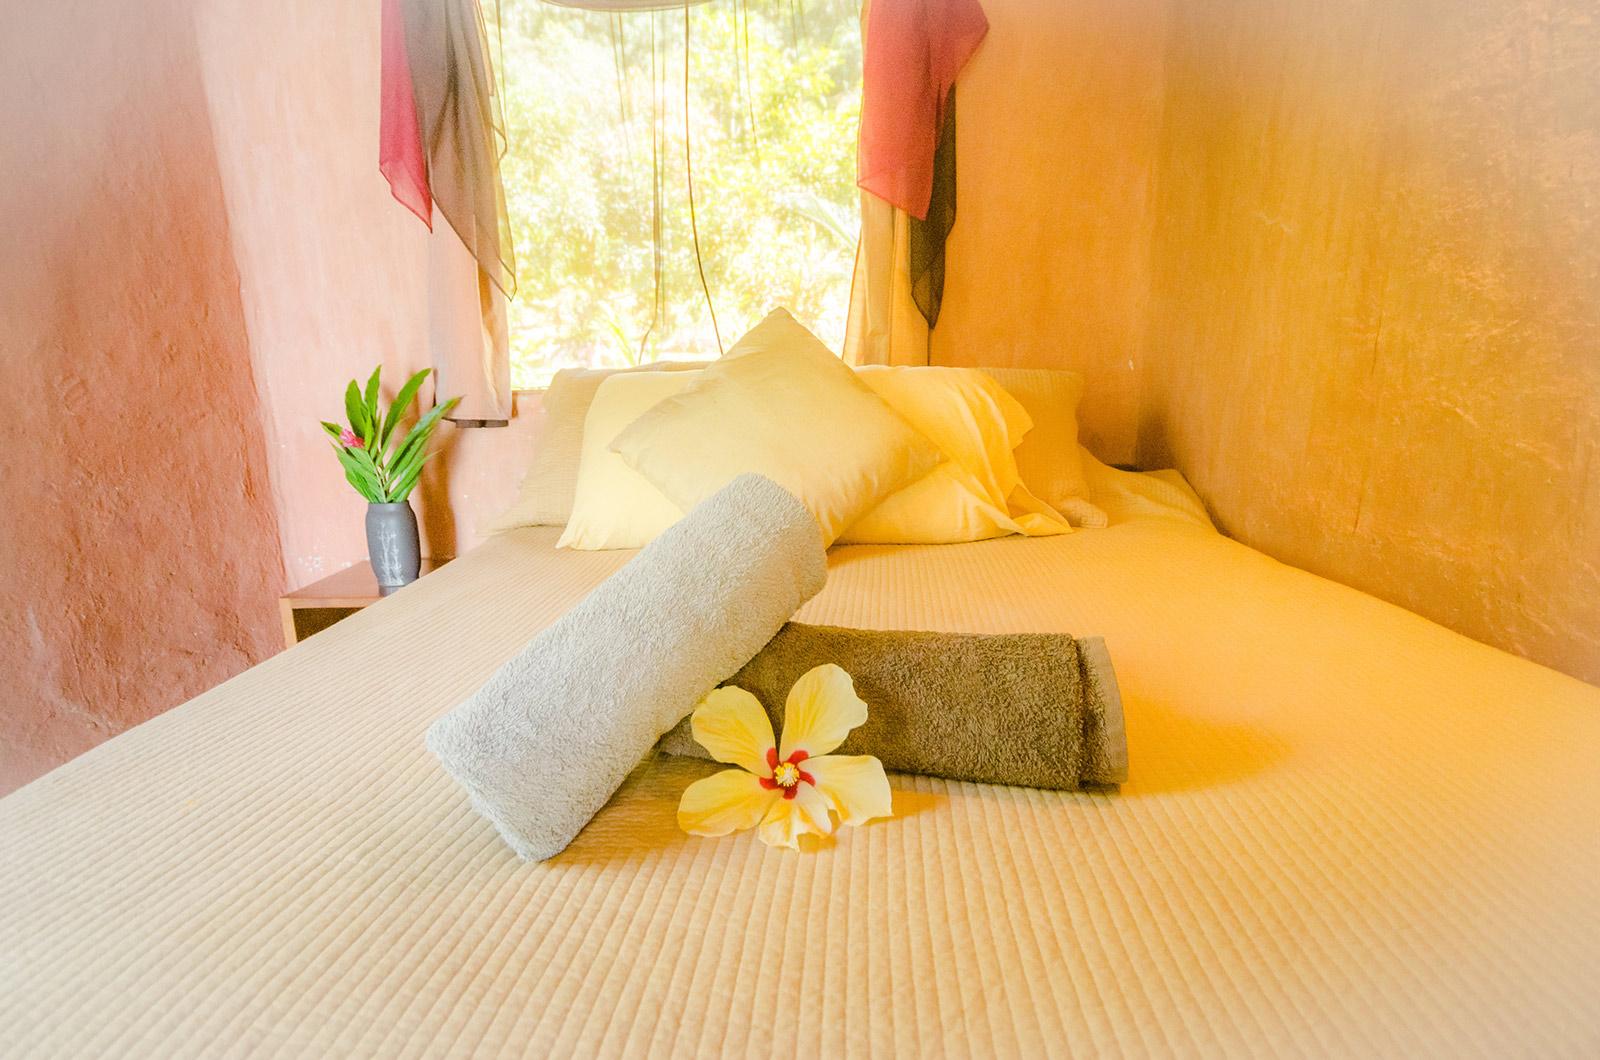 retreat_selva-armonia_yoga-march_2017-room_one_3.jpg